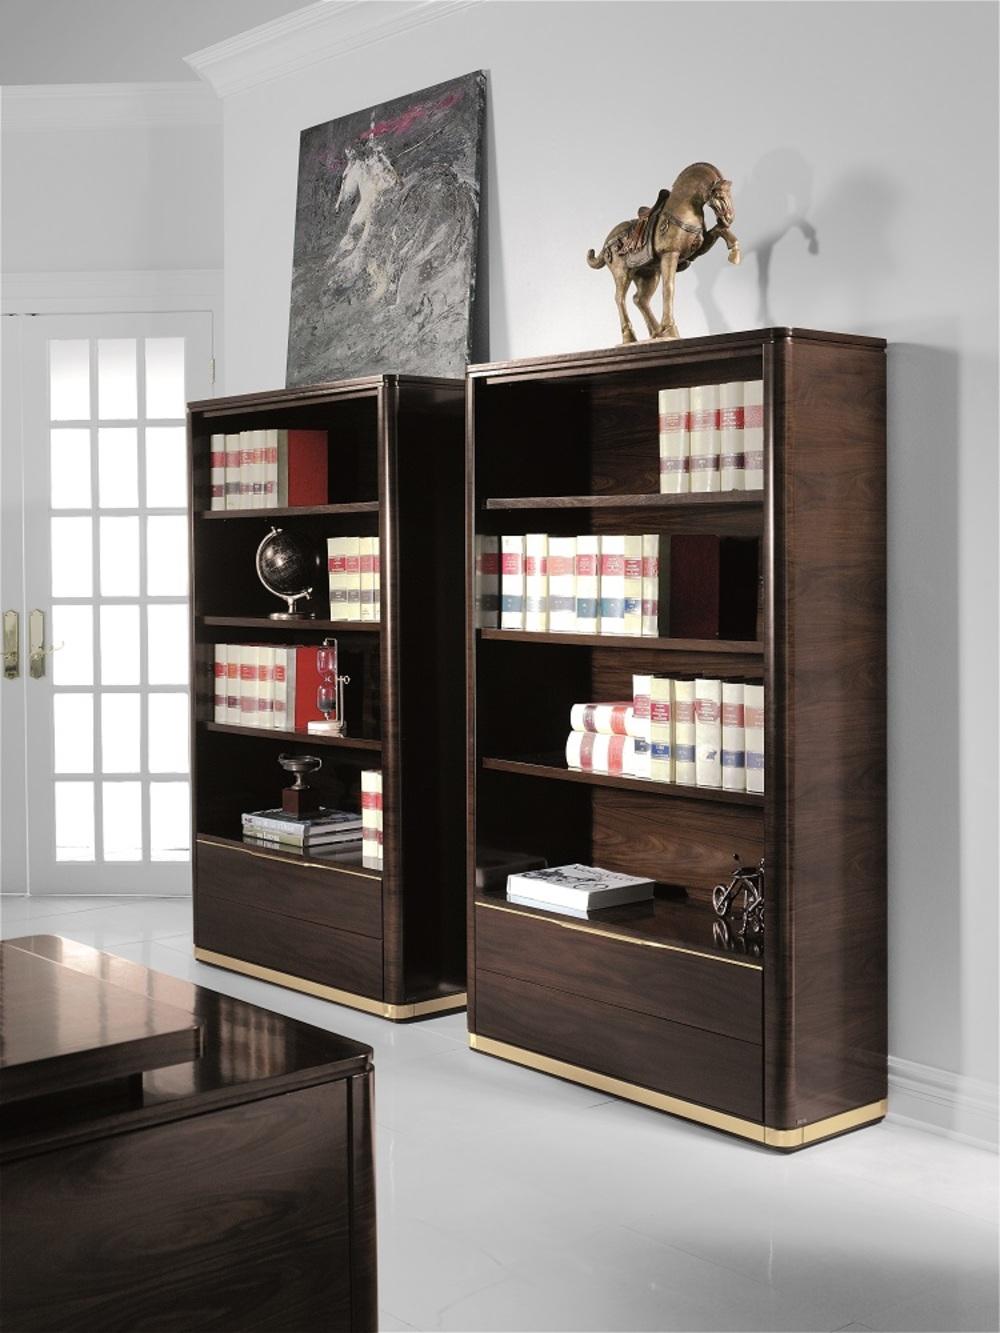 Hurtado - Santa Barbara Bookcase with Wooden Front